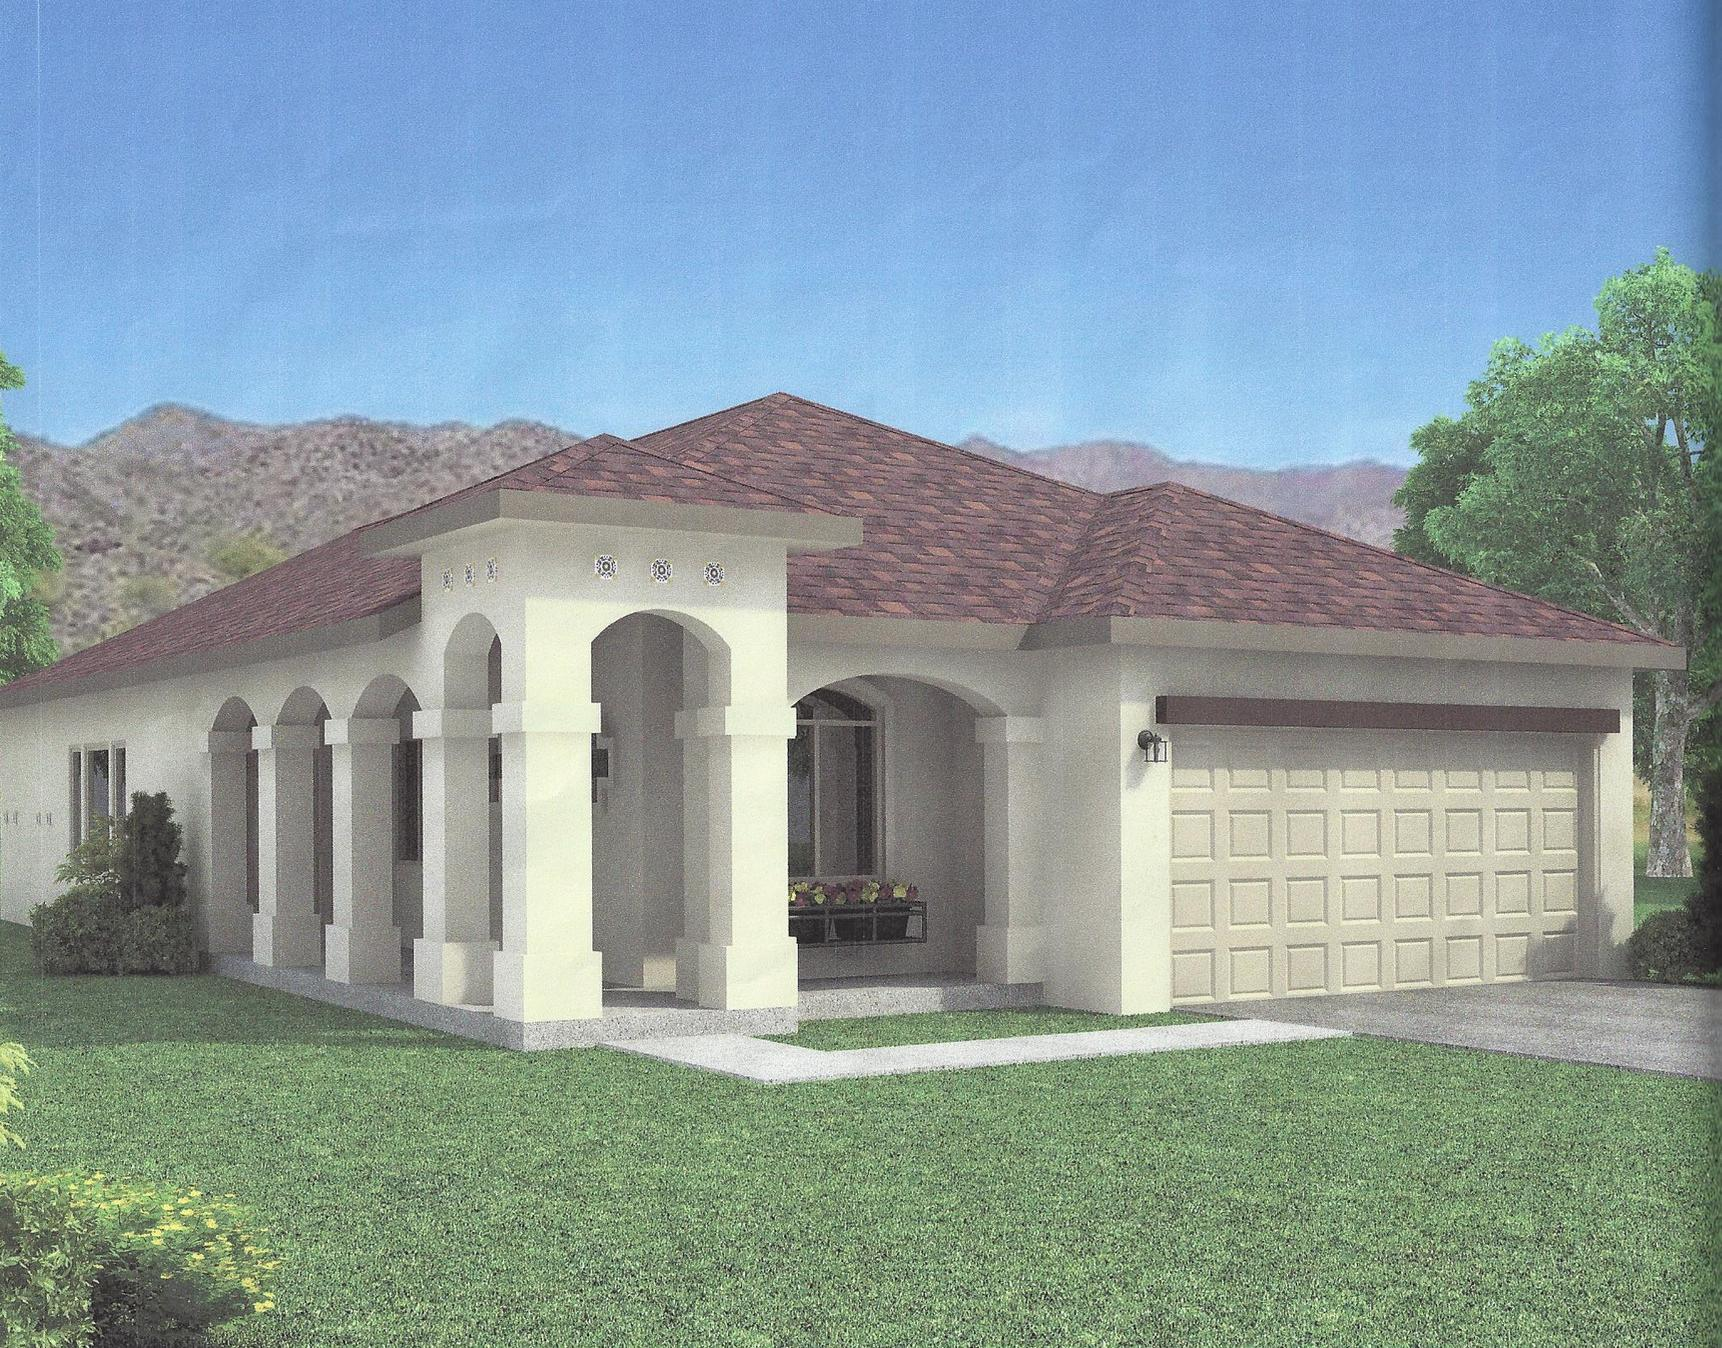 14349 Seth Payne, Horizon City, Texas 79928, 4 Bedrooms Bedrooms, ,2 BathroomsBathrooms,Residential,For sale,Seth Payne,812250